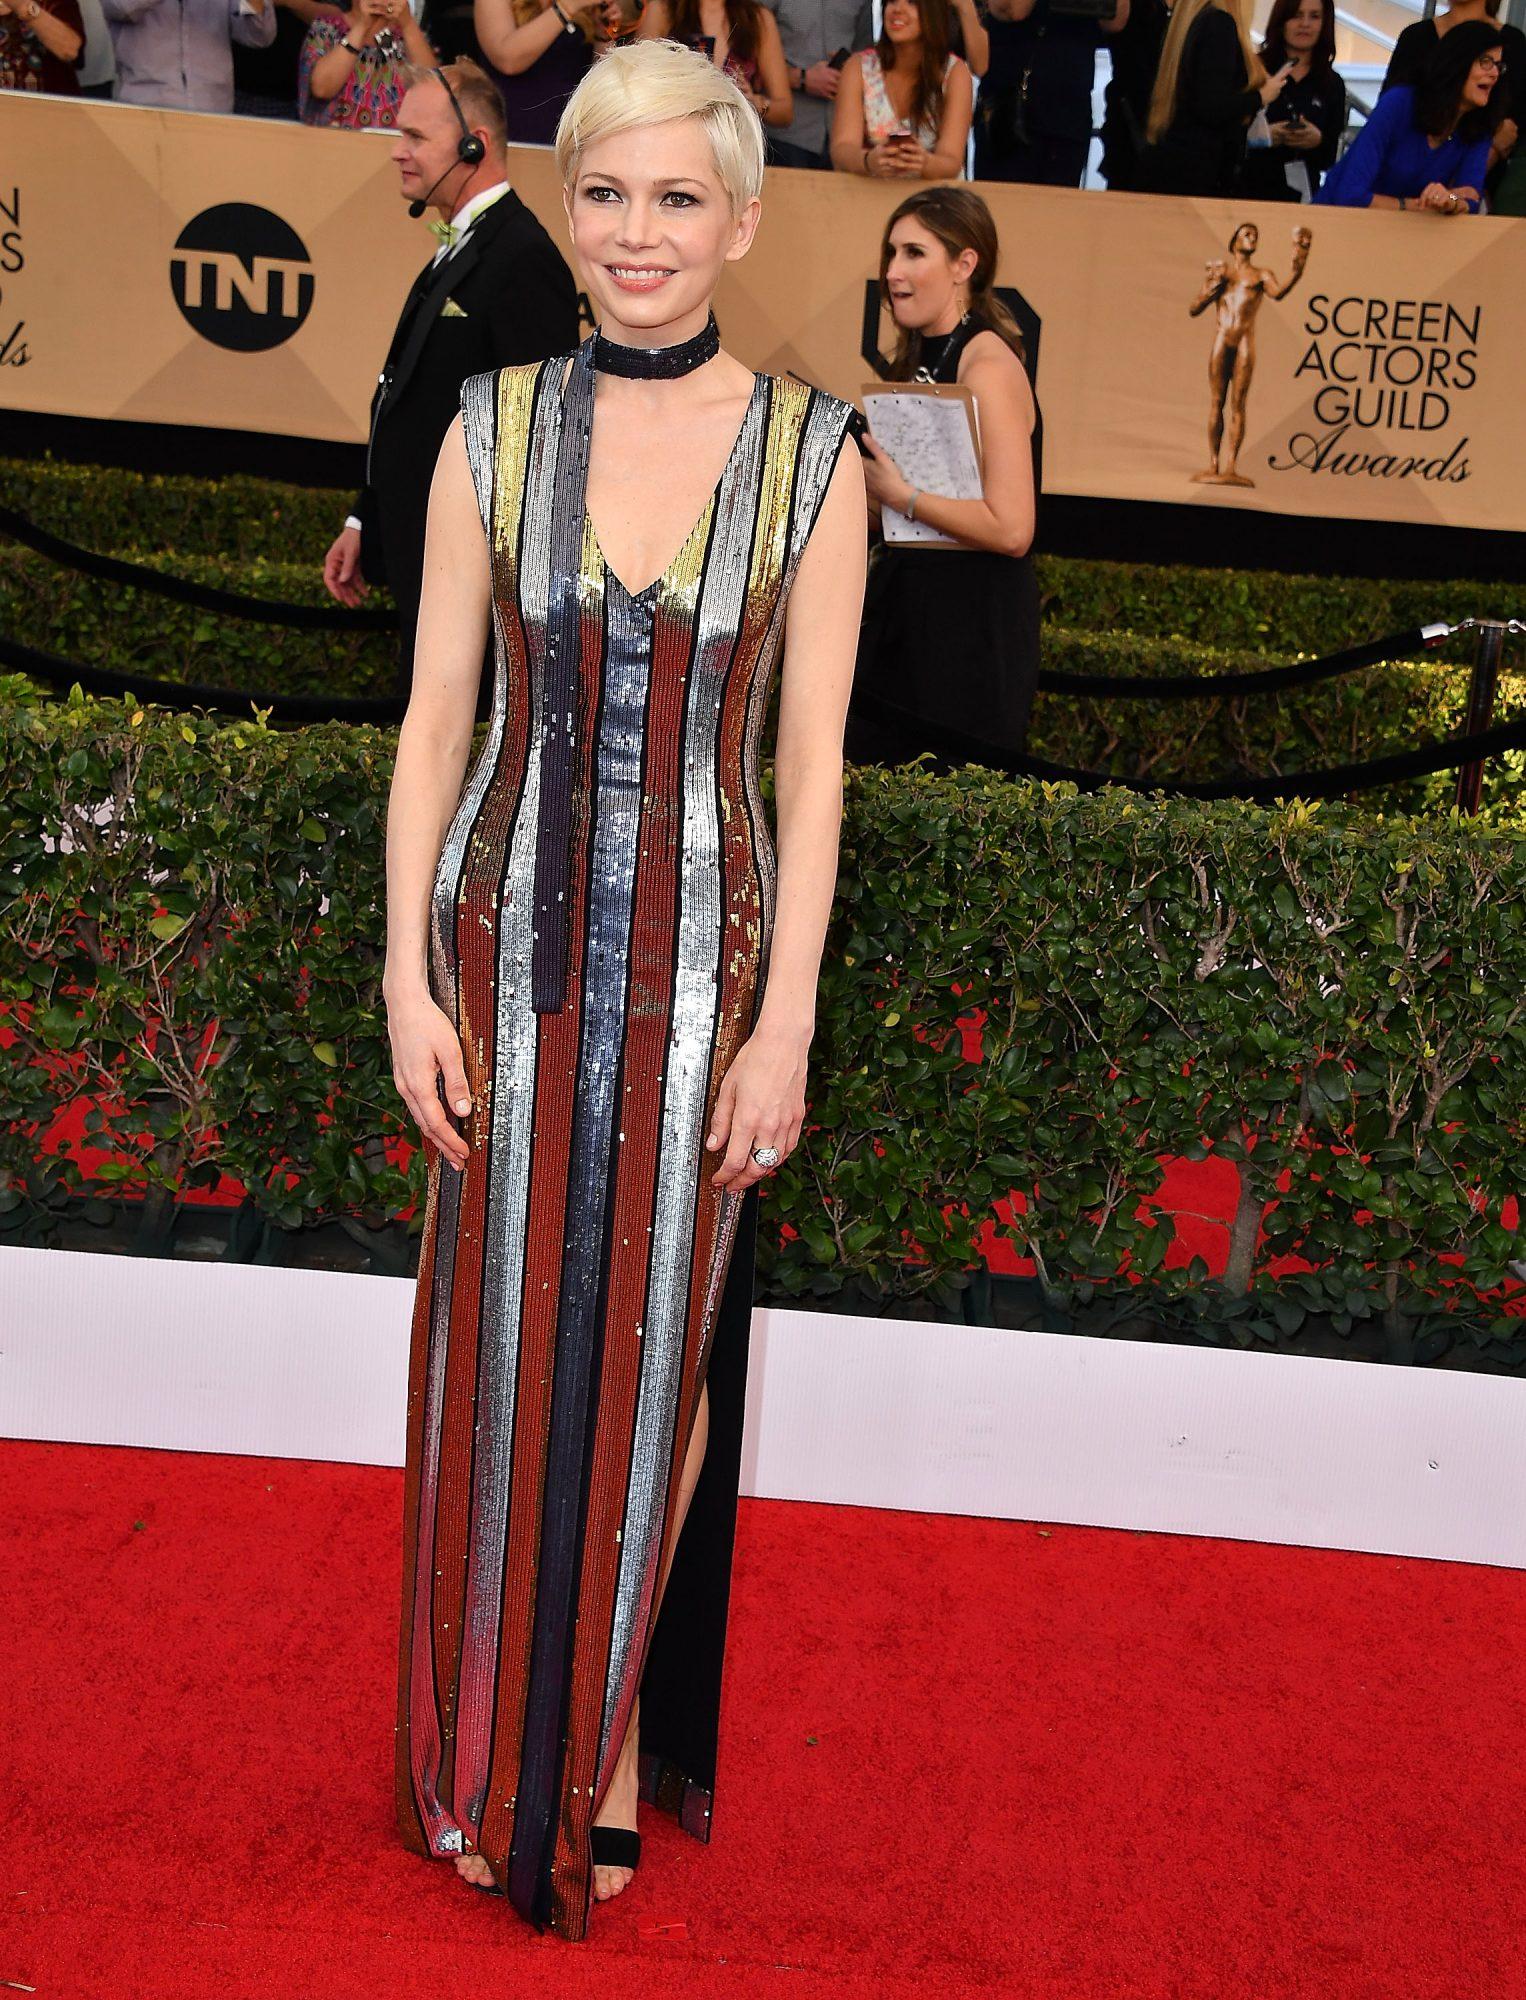 Michelle-Williams-dress.jpg